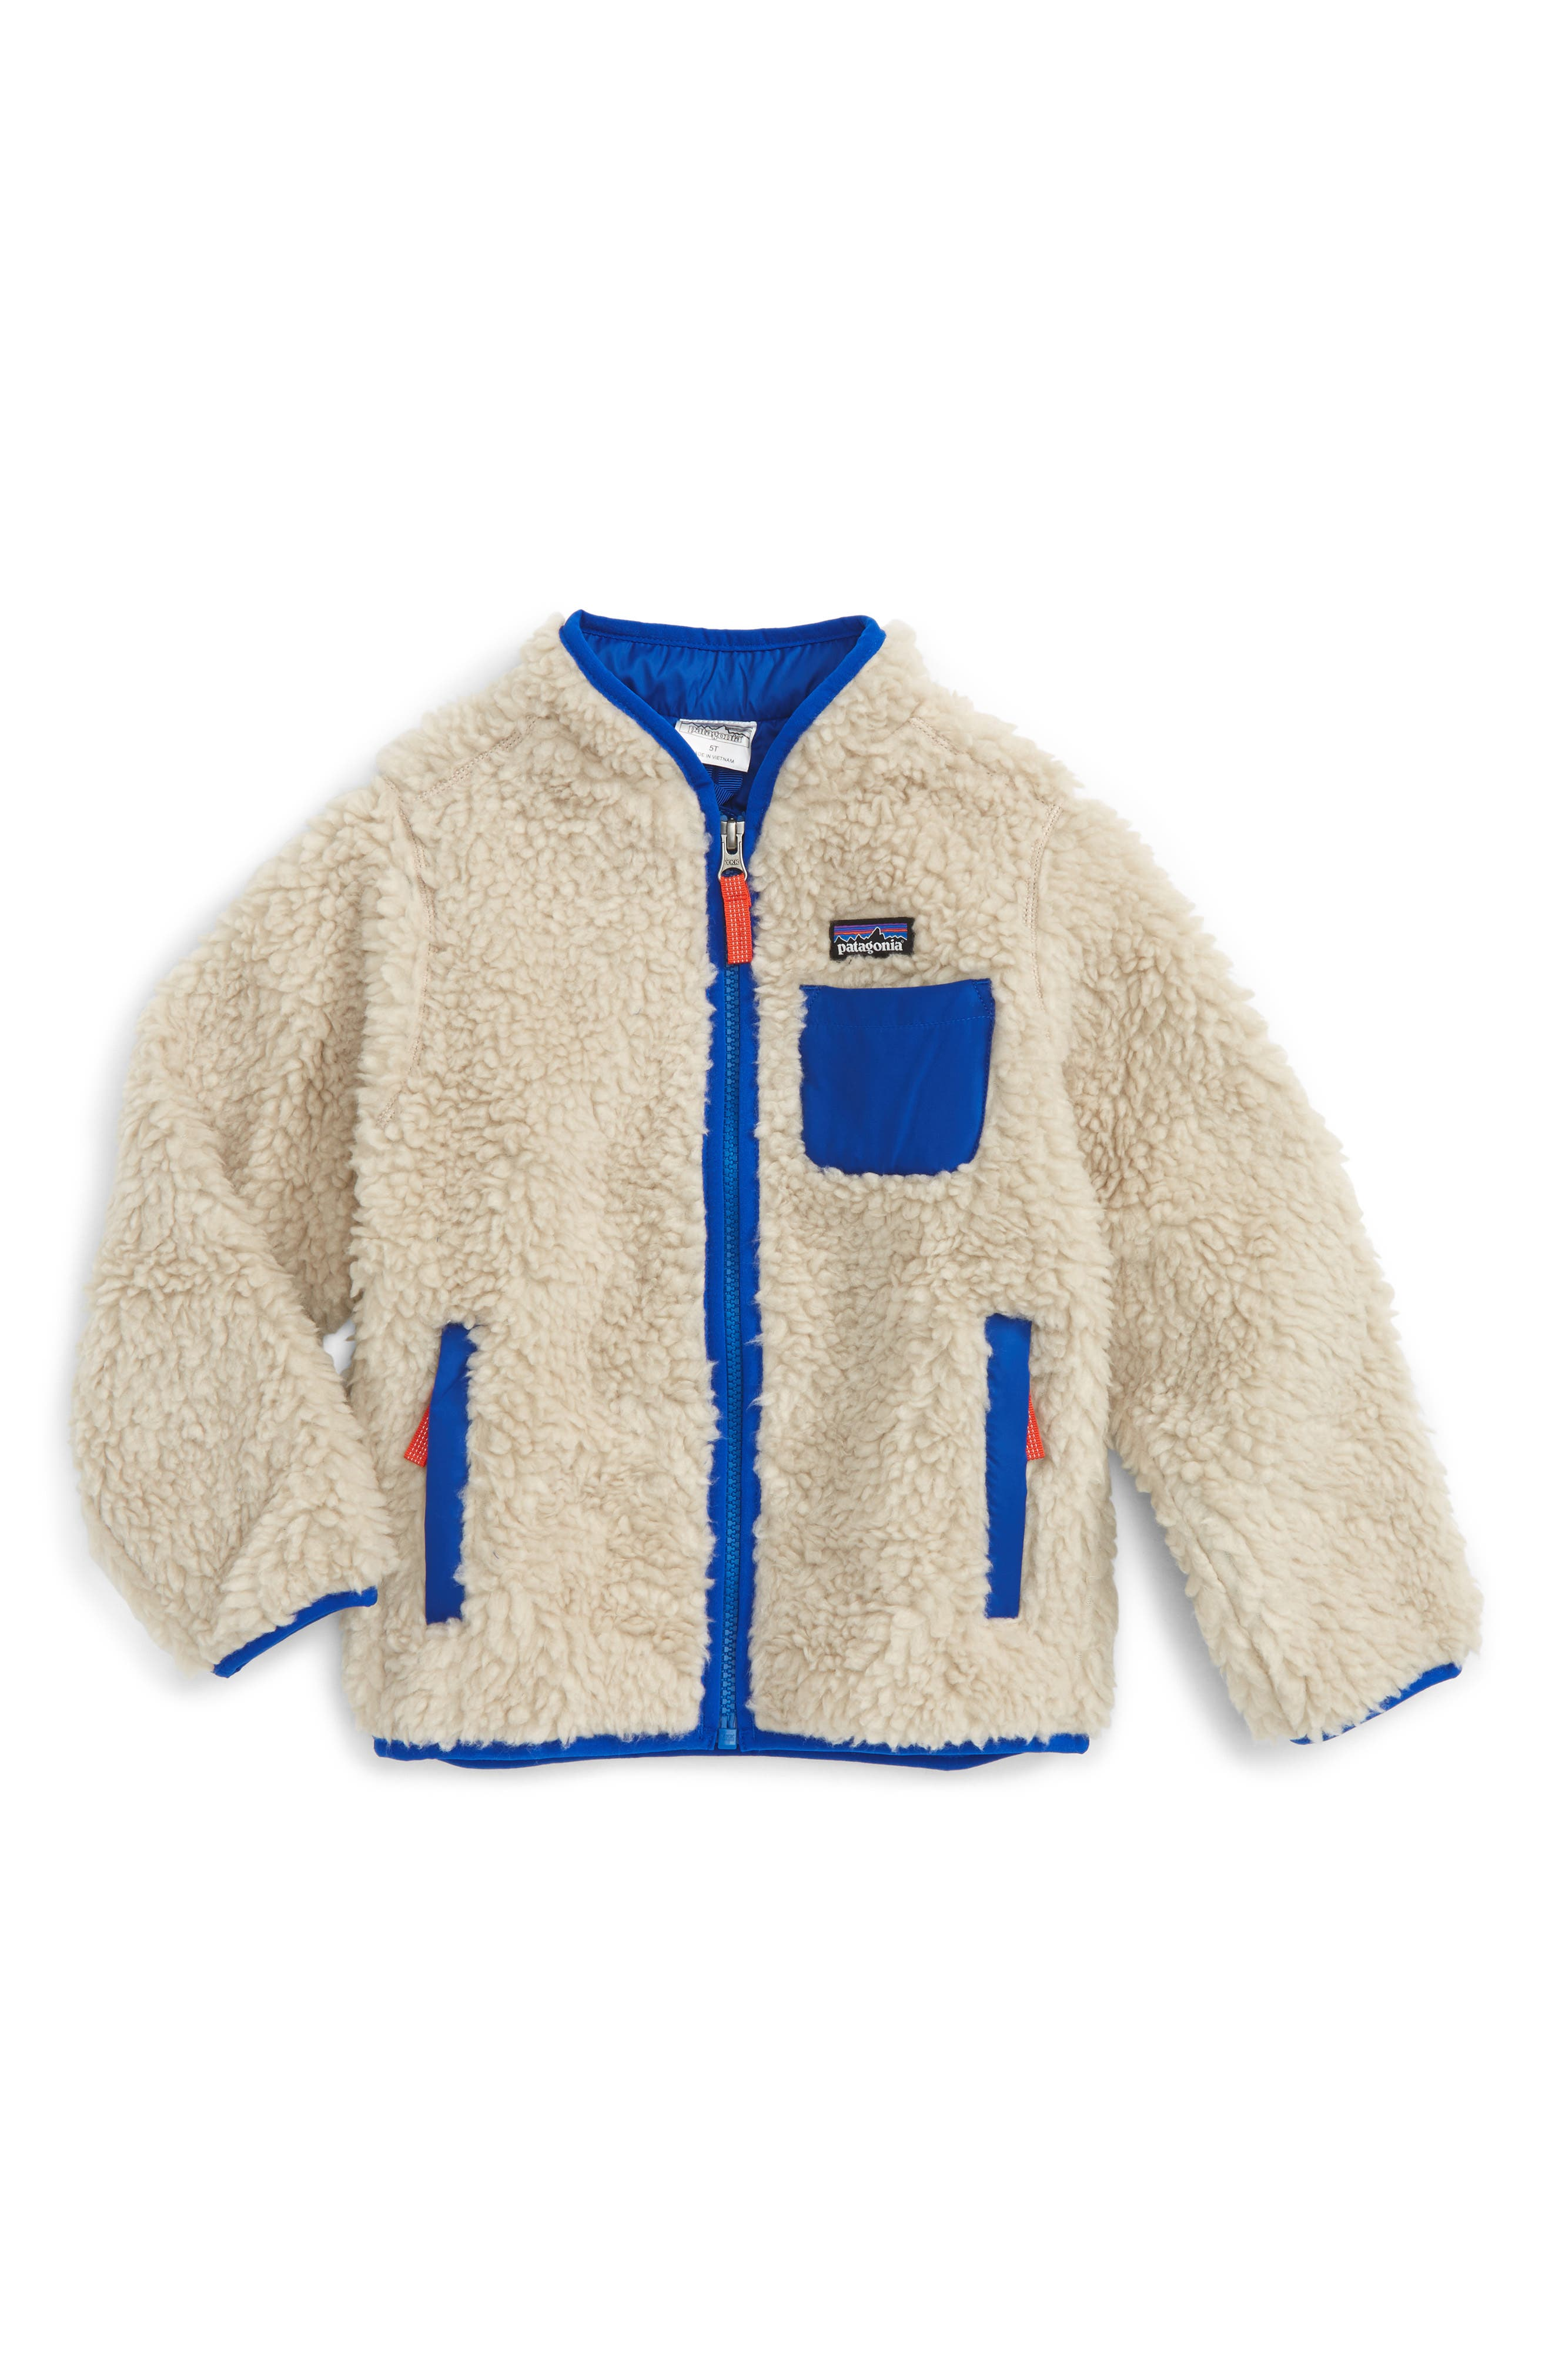 PATAGONIA,                             Retro-X Windproof Fleece Jacket,                             Main thumbnail 1, color,                             257